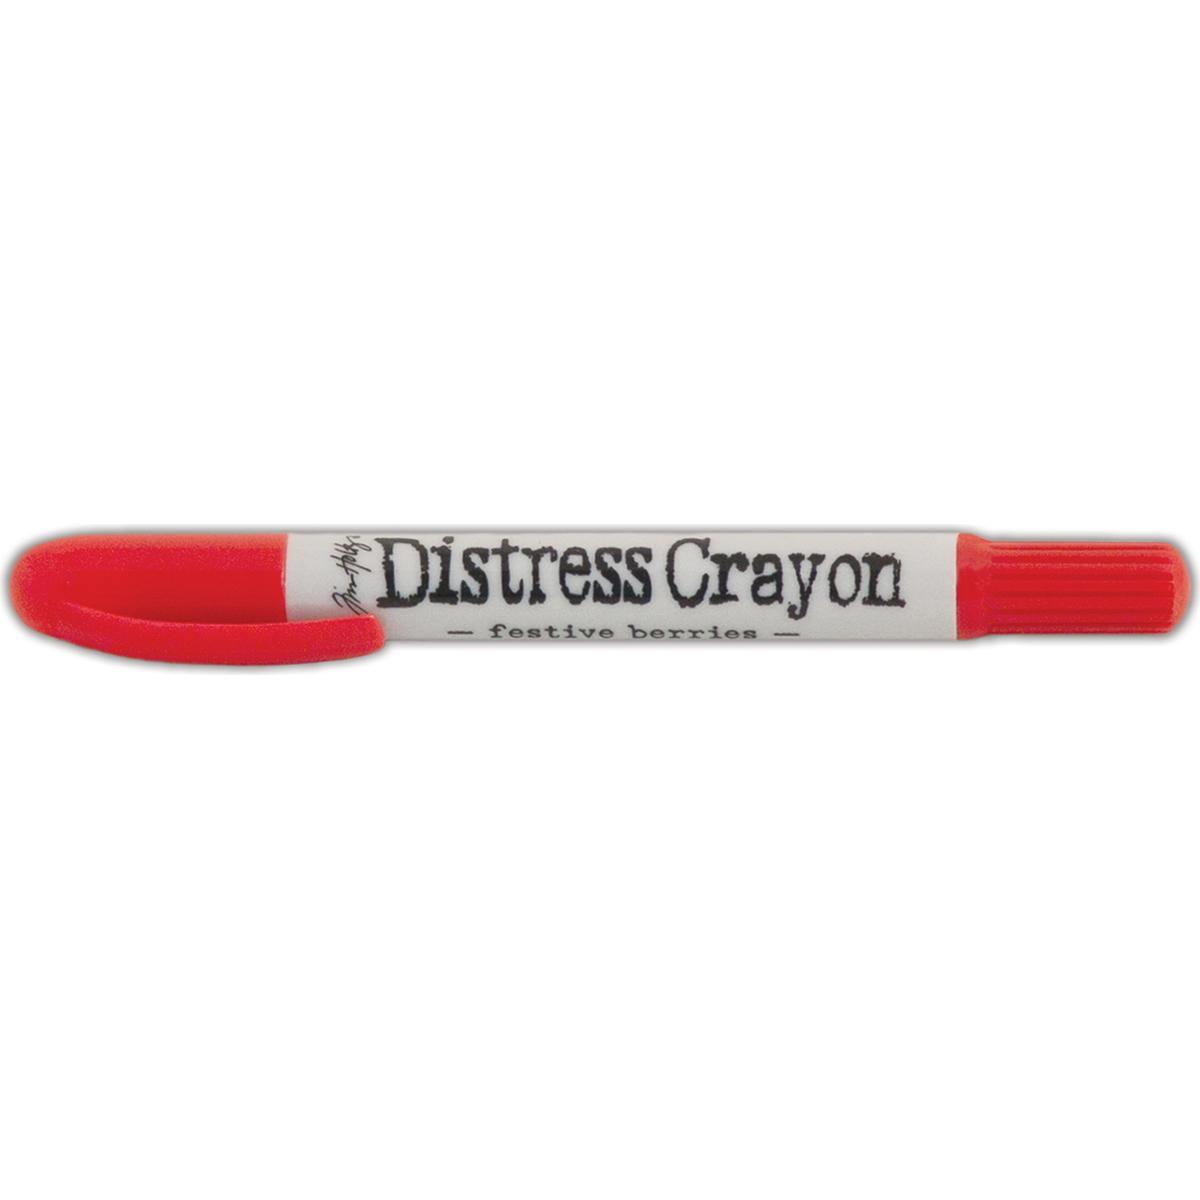 Distress Crayon festive berries